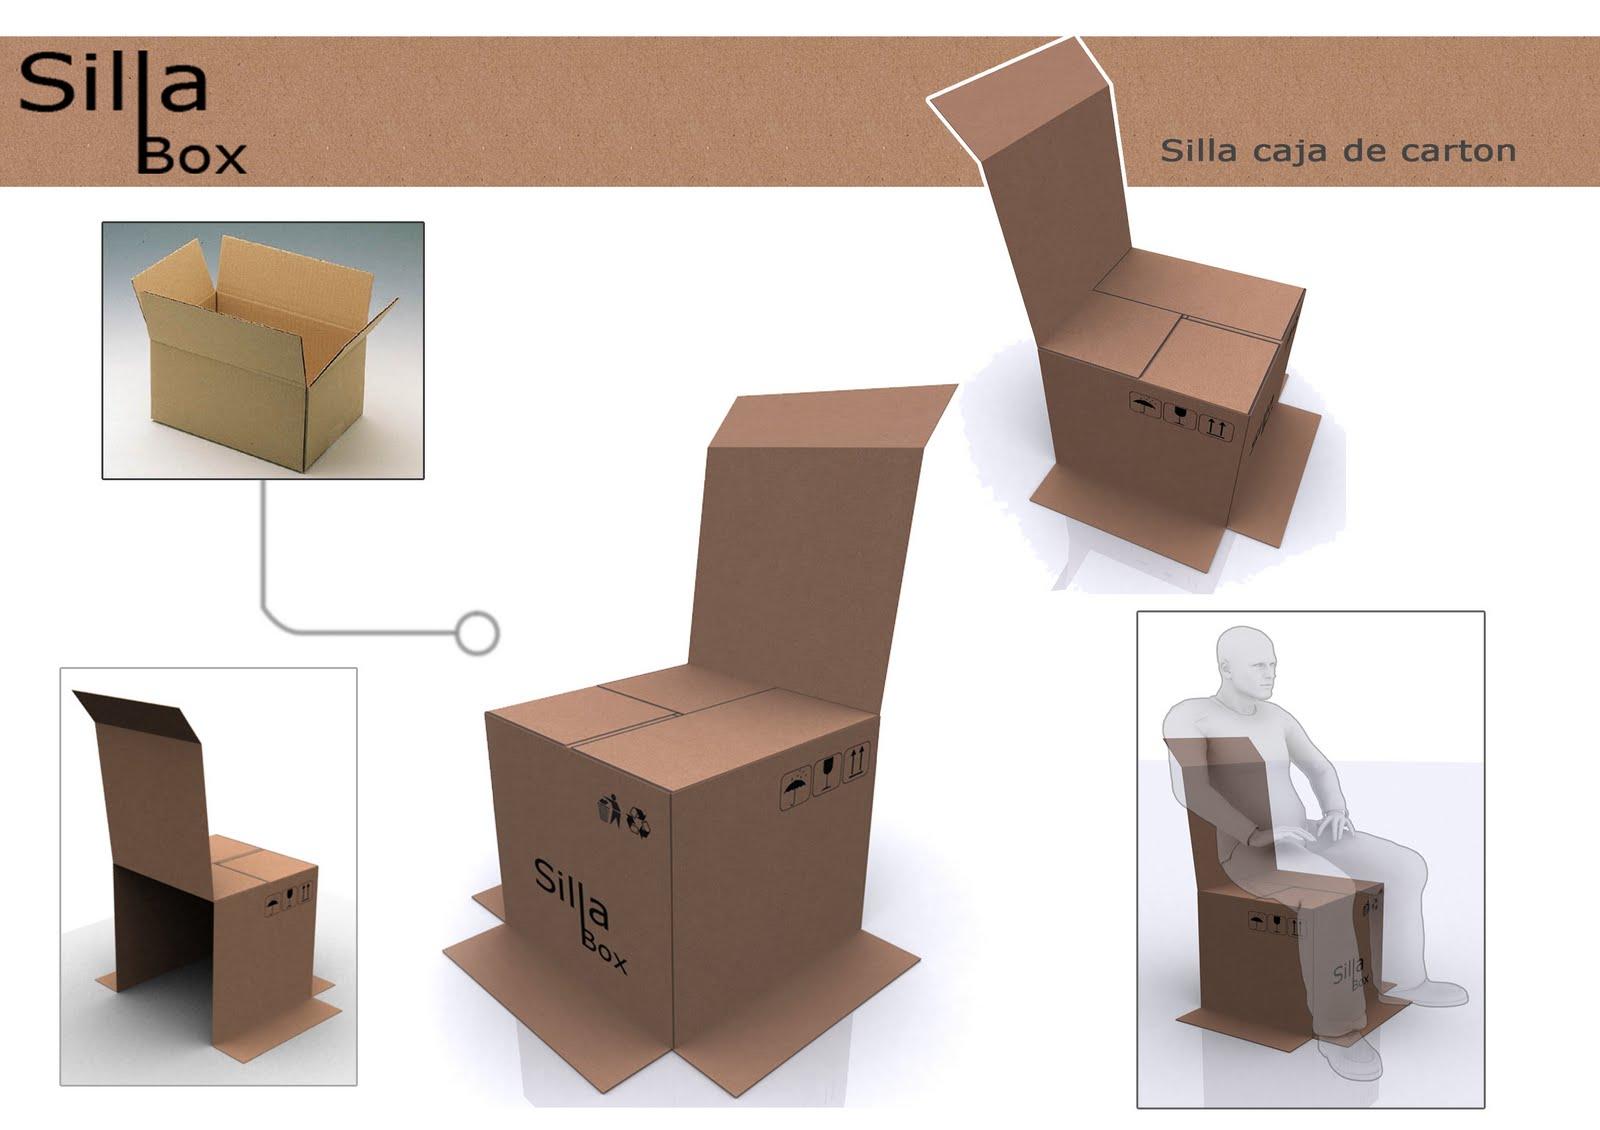 Apuntes revista digital de arquitectura algunas sillas - Tapizar un sillon paso a paso ...